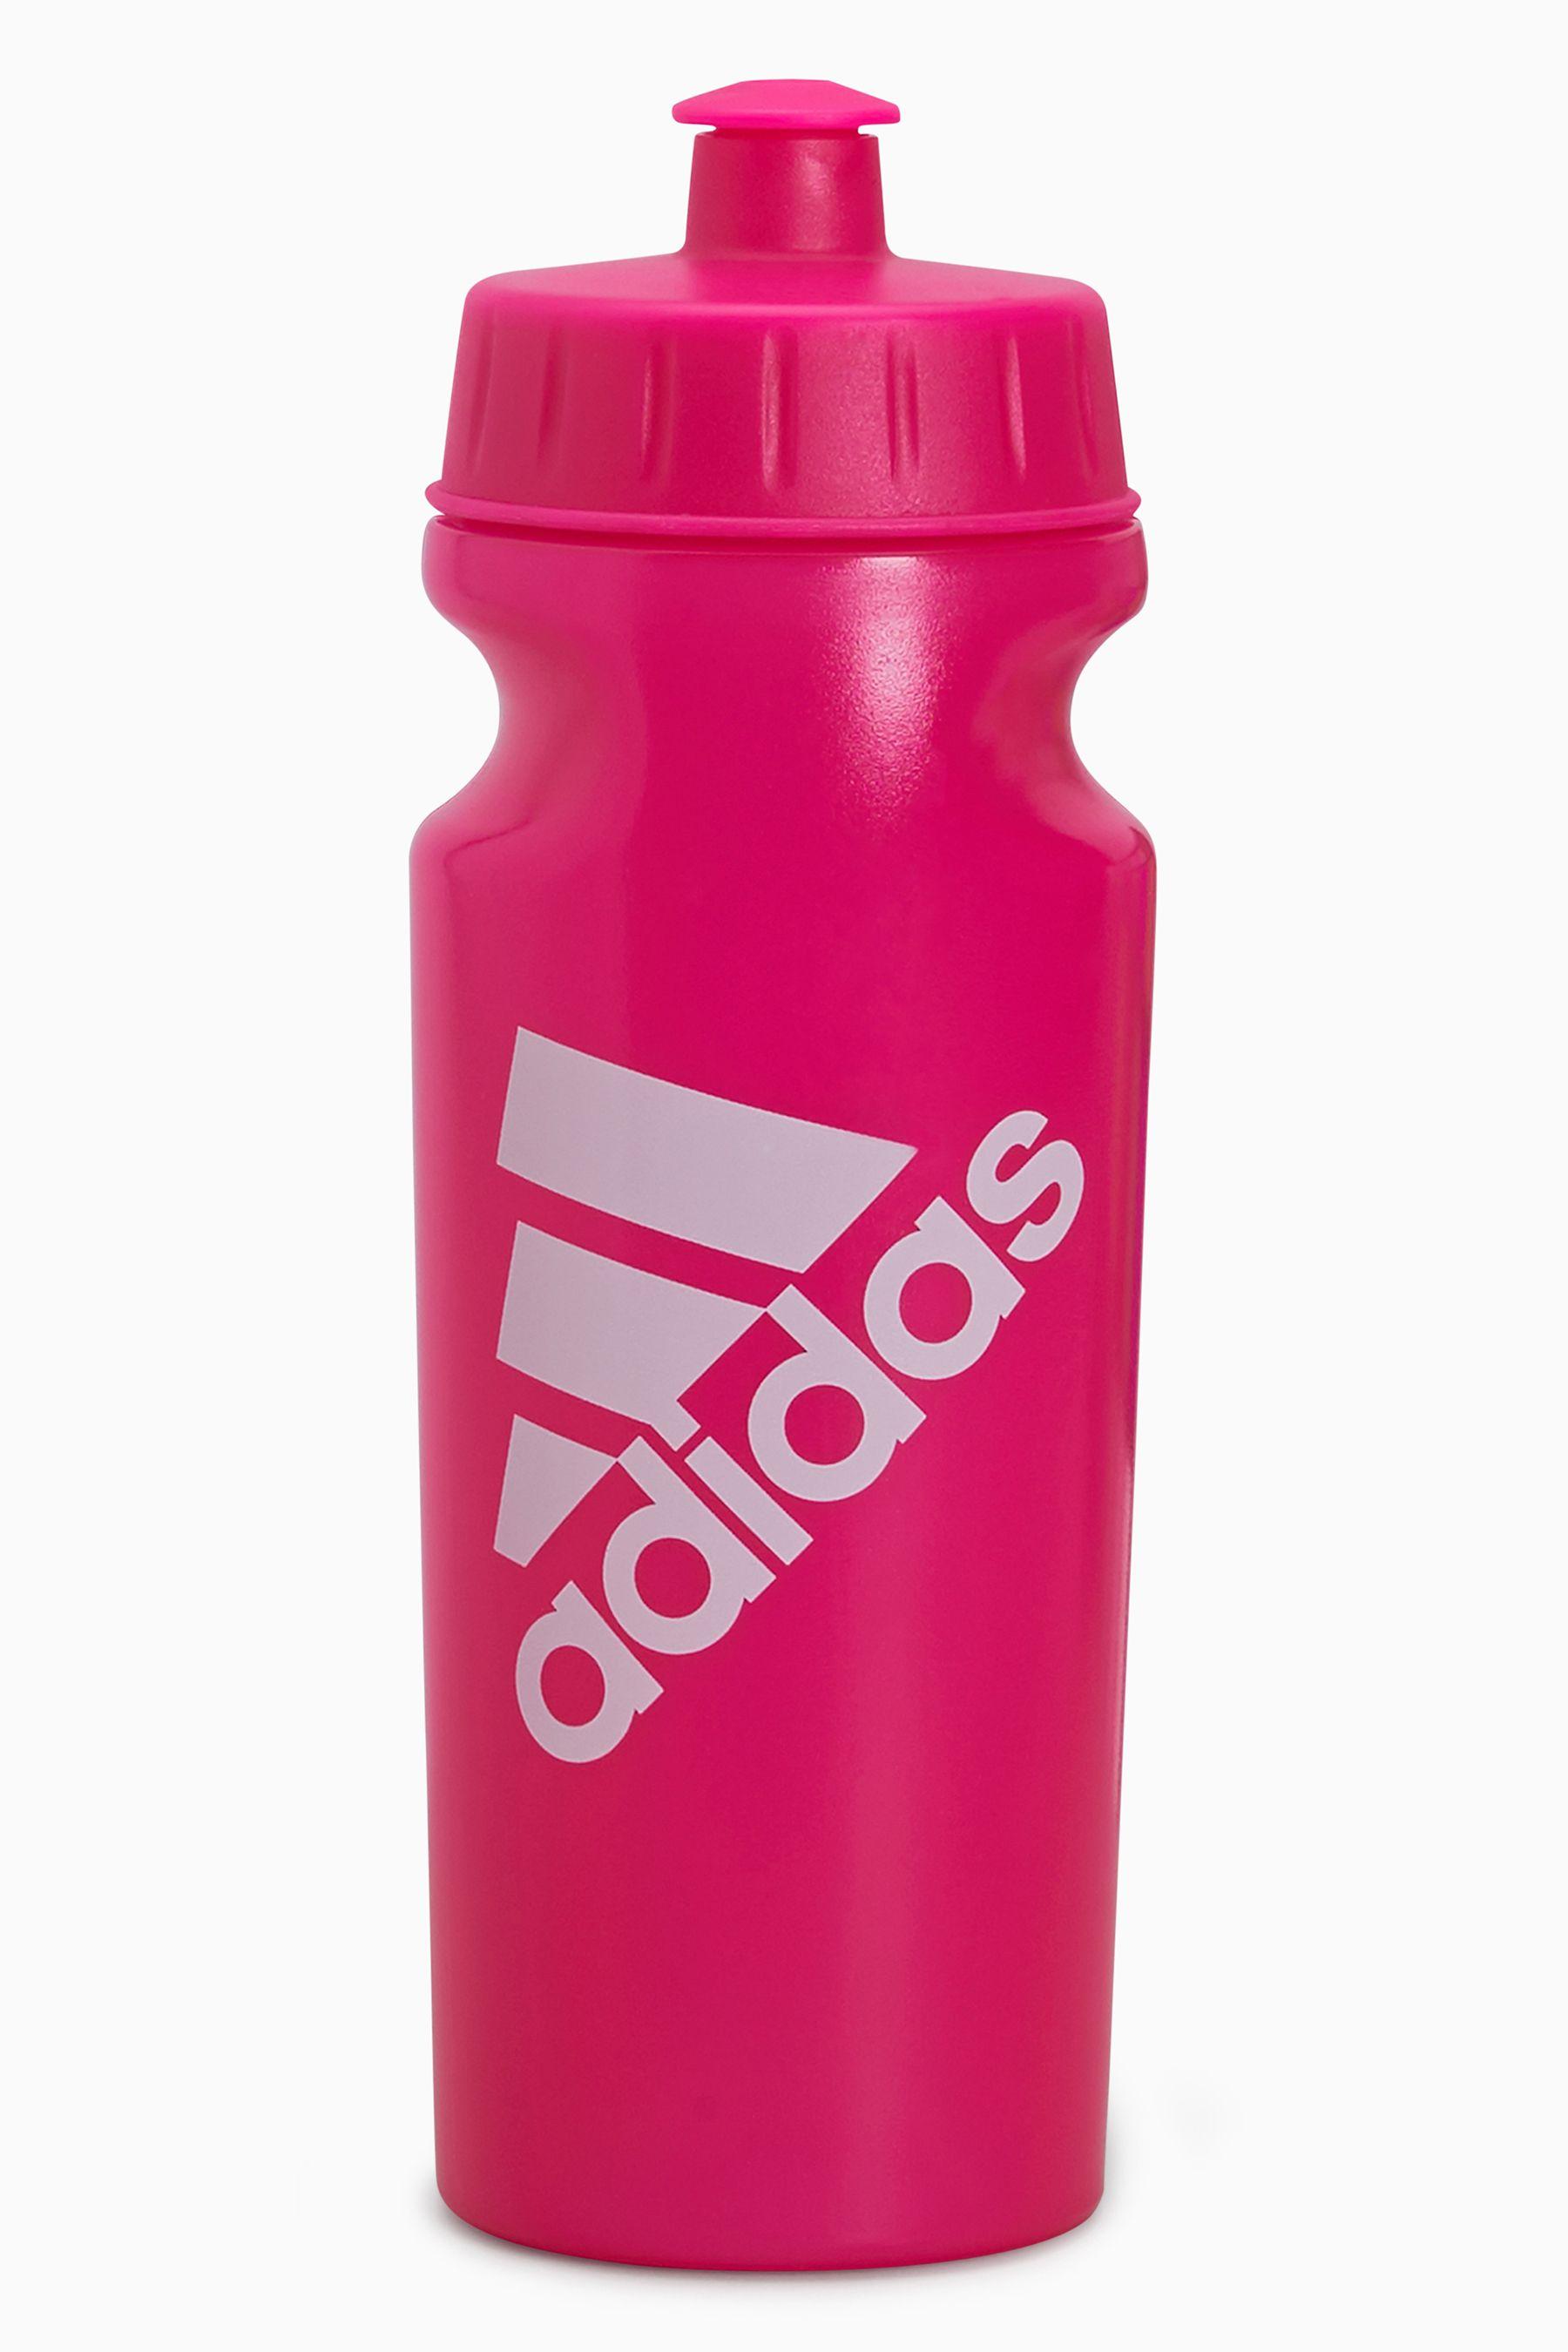 Womens adidas Pink Water Bottle Pink Pink water bottle